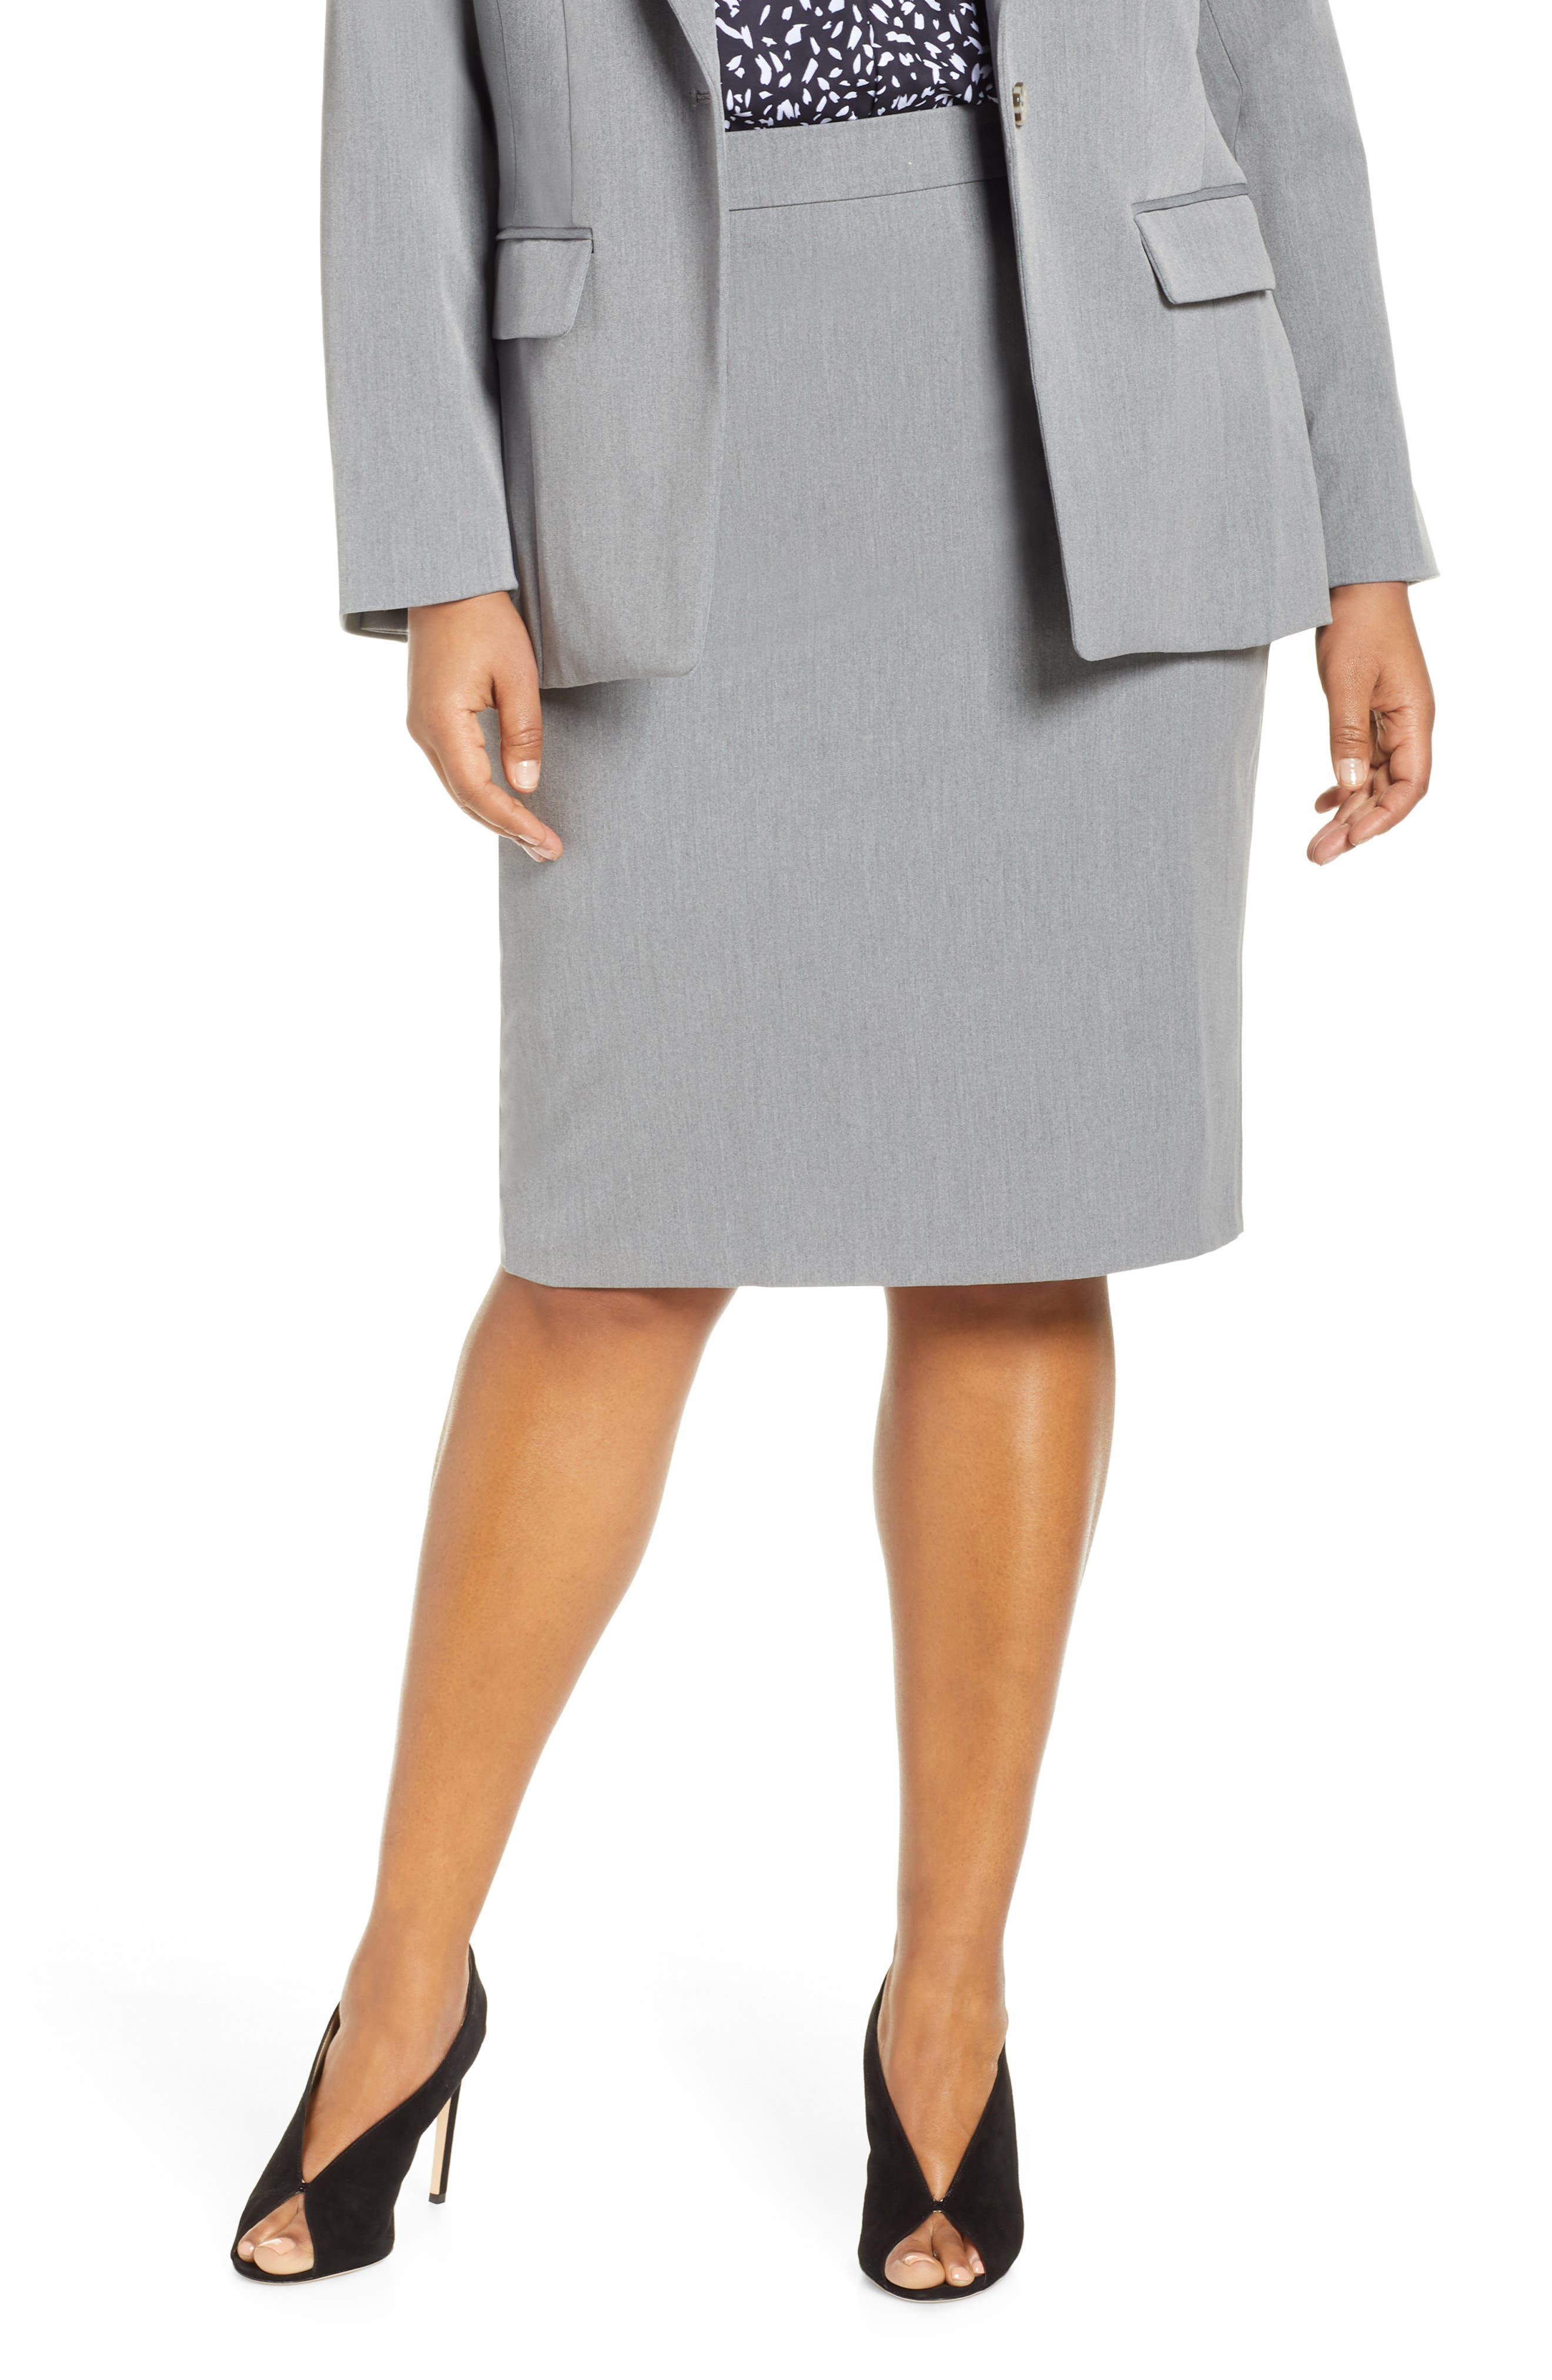 Plus Size Eloquii Stretch Pencil Skirt, Grey